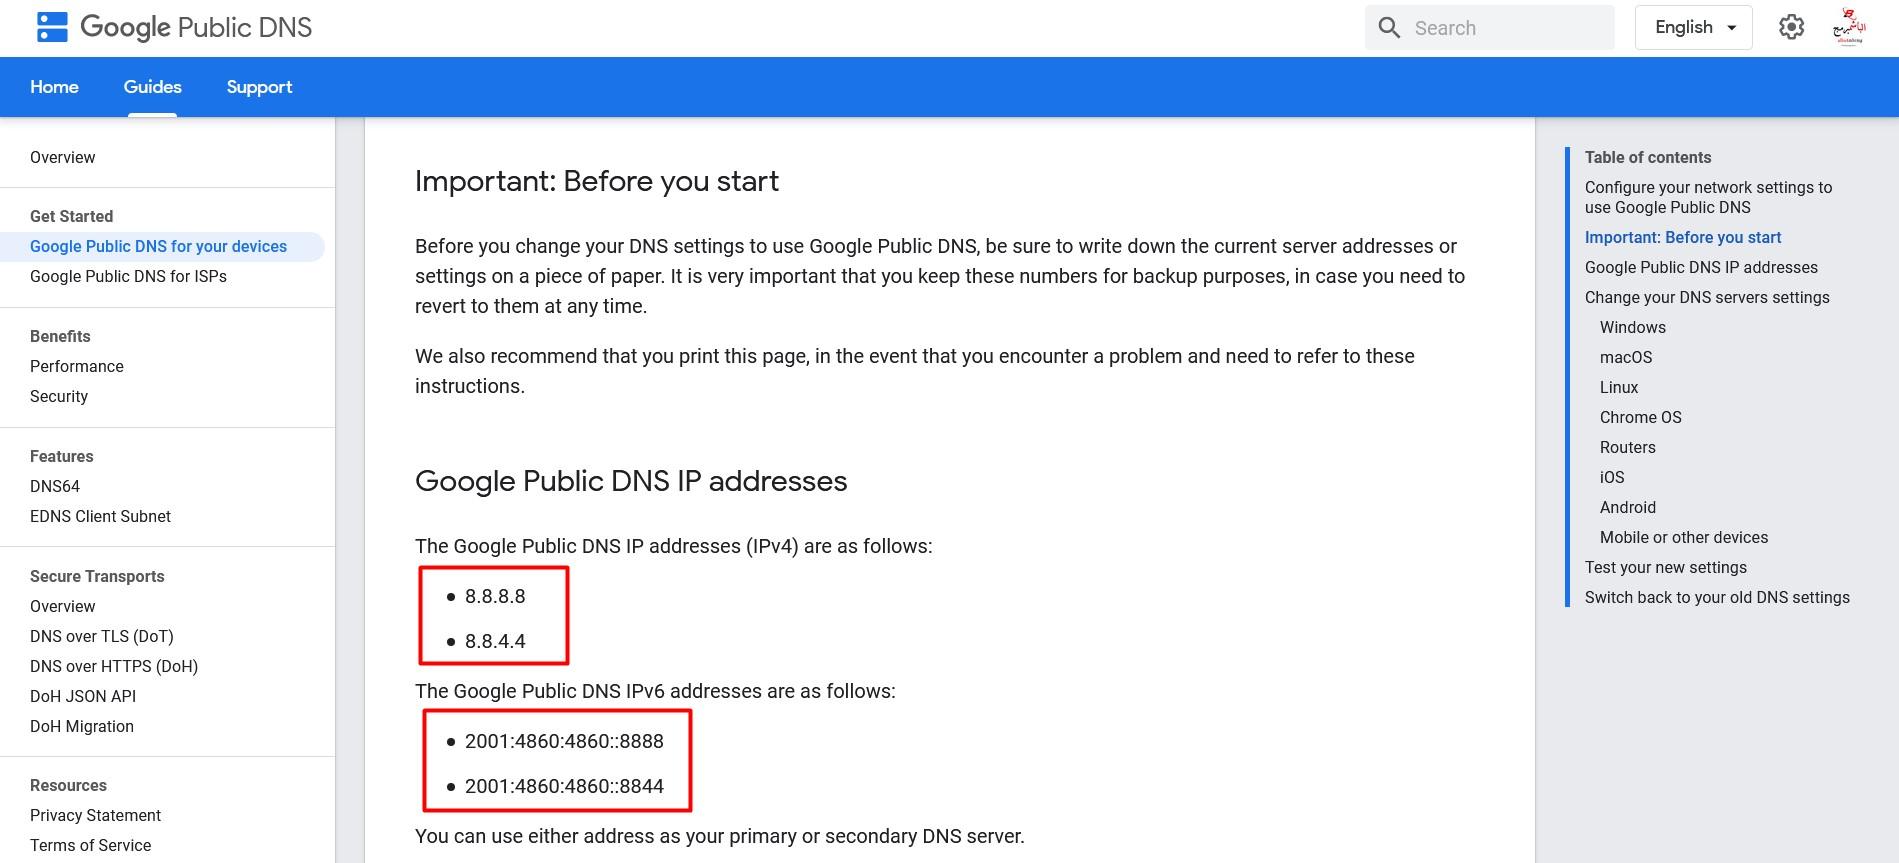 Google Public DNS IP addresses